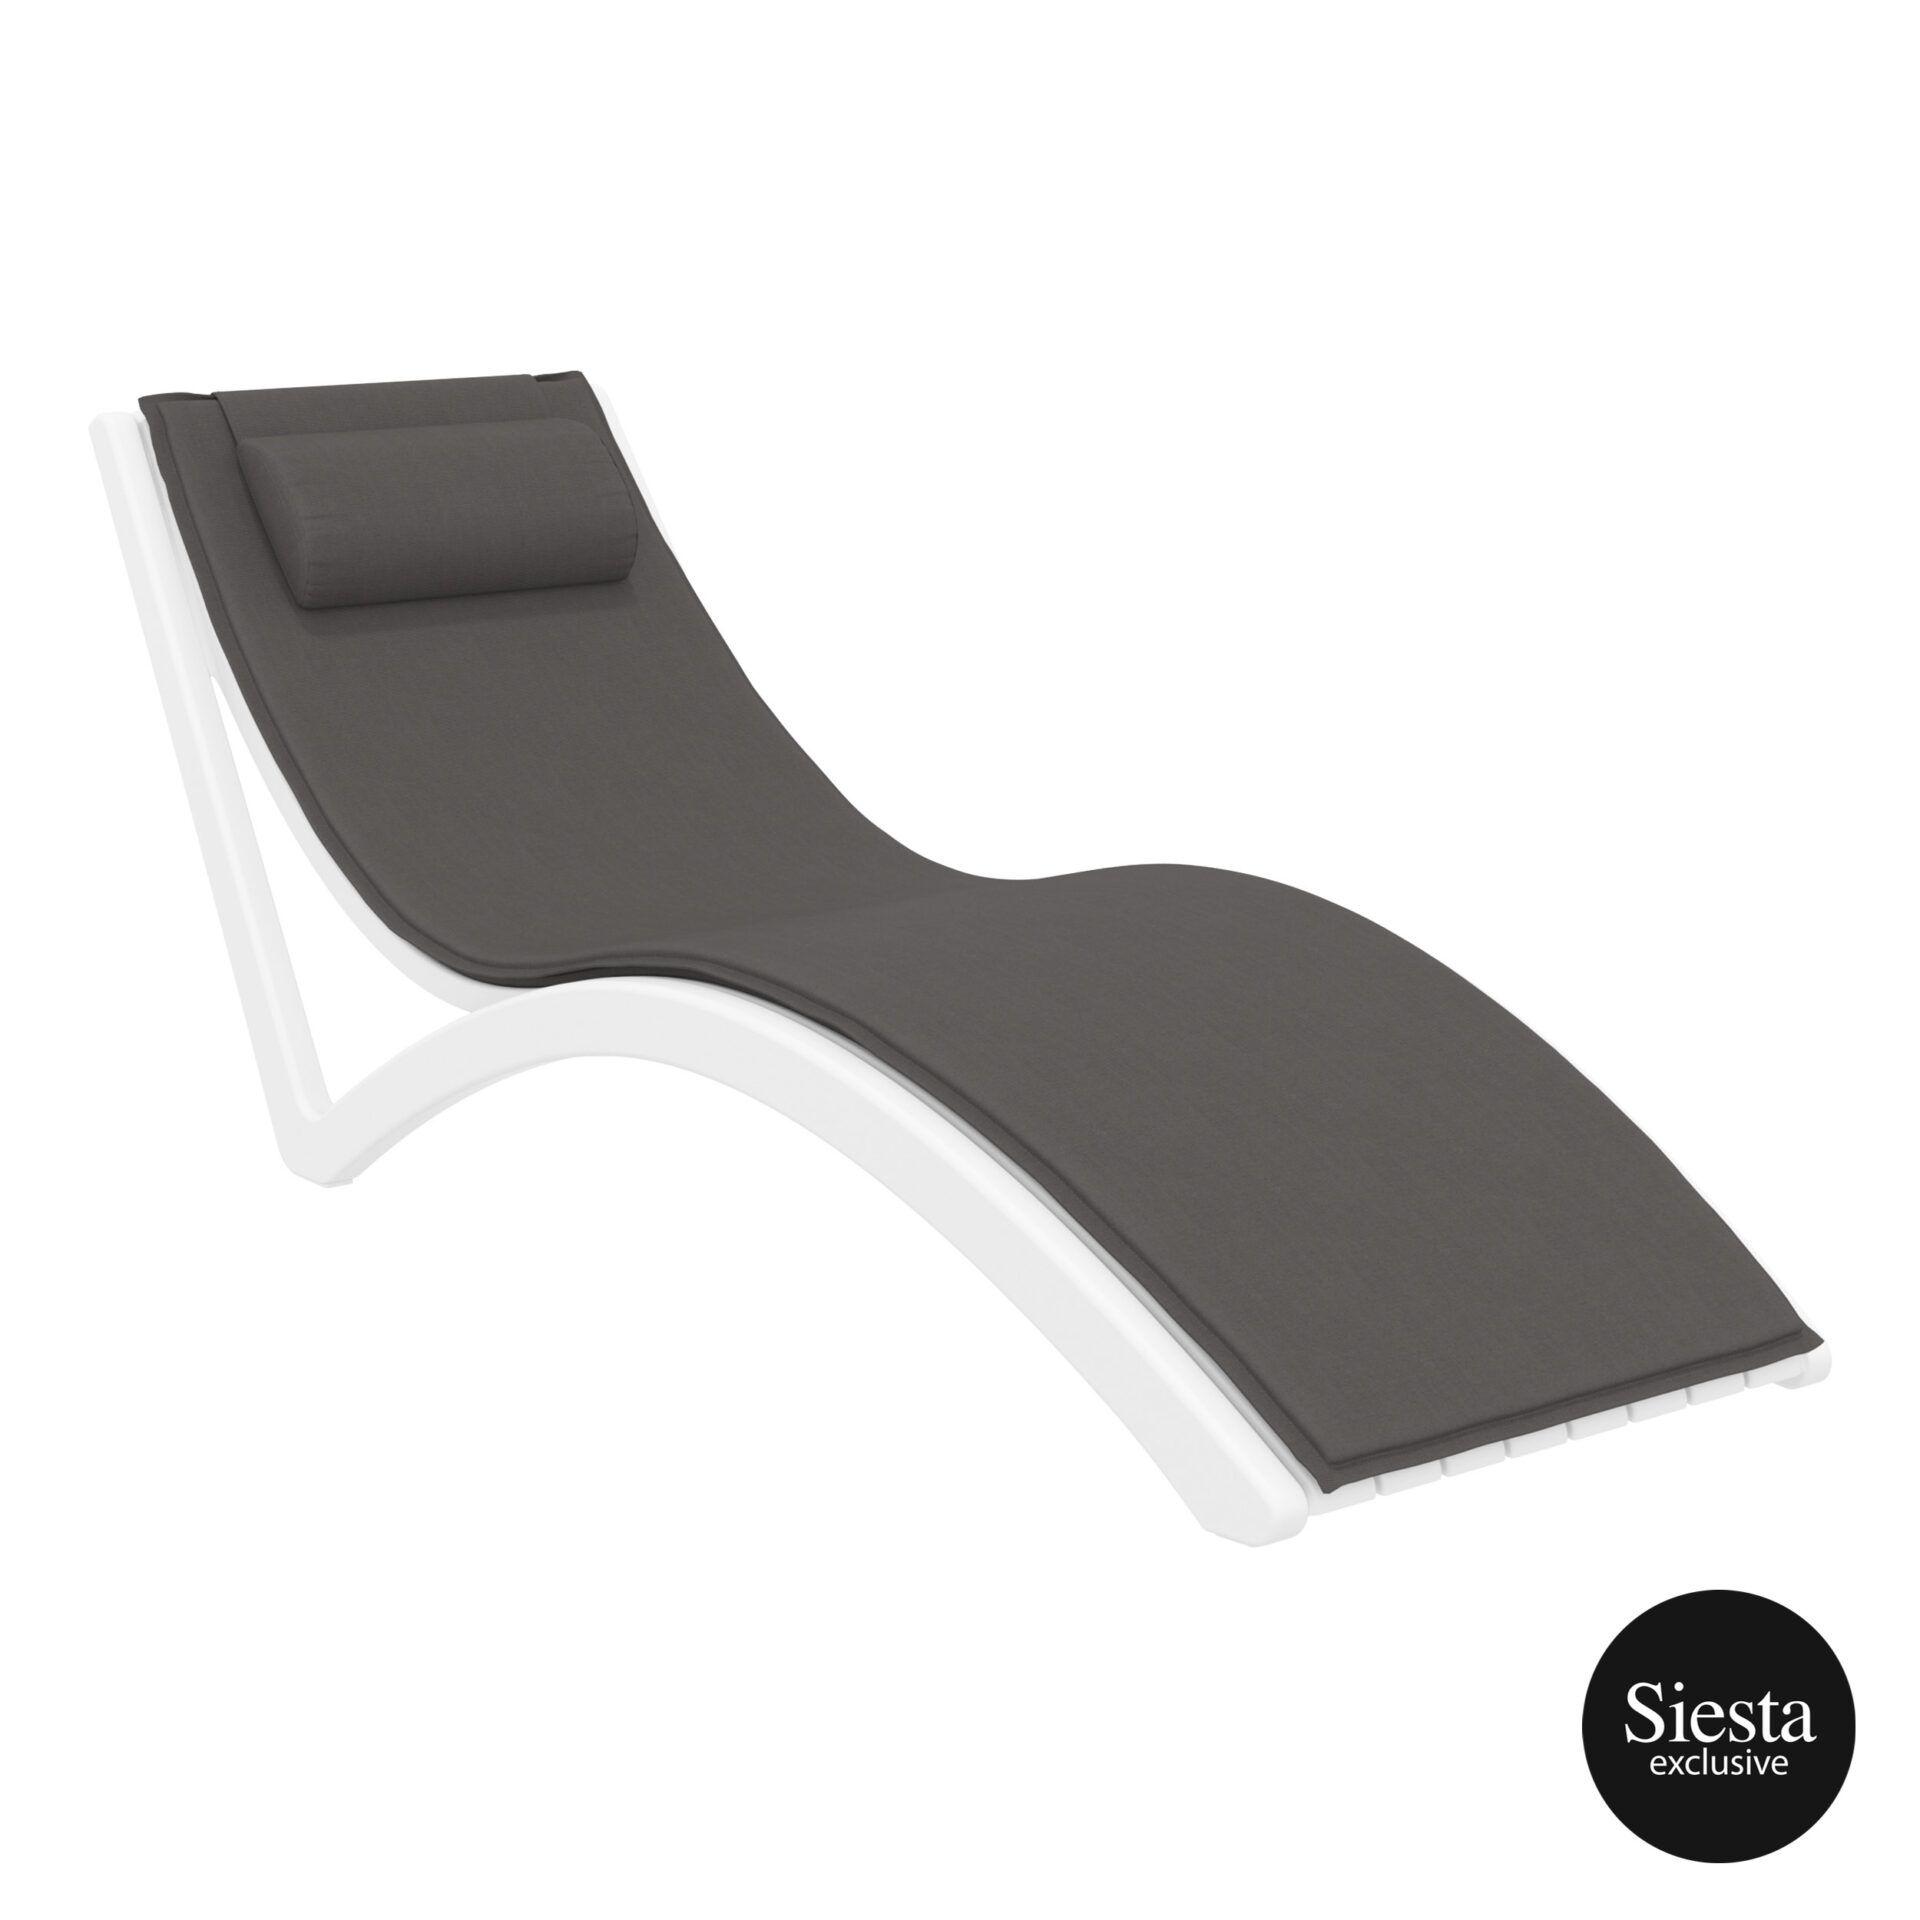 outdoor polypropylene slim sunlounger pillow cushion white darkgrey front side